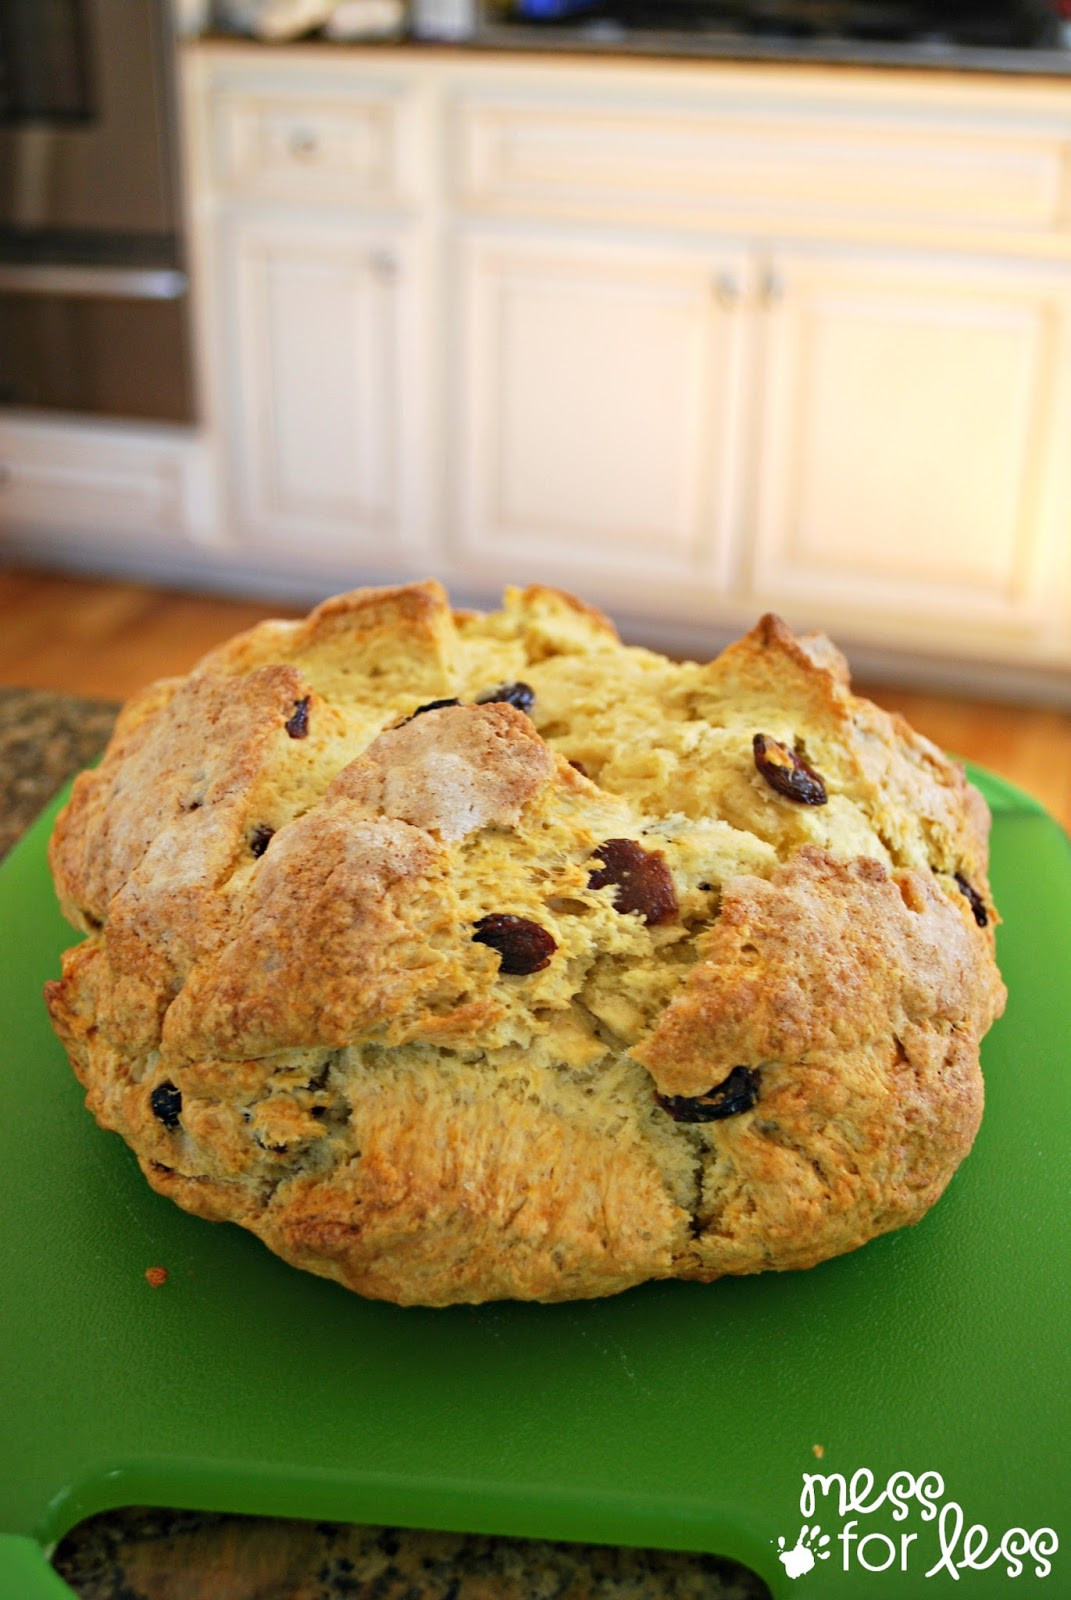 How To Make Irish Soda Bread  Irish Soda Bread Recipe Food Fun Friday Mess for Less